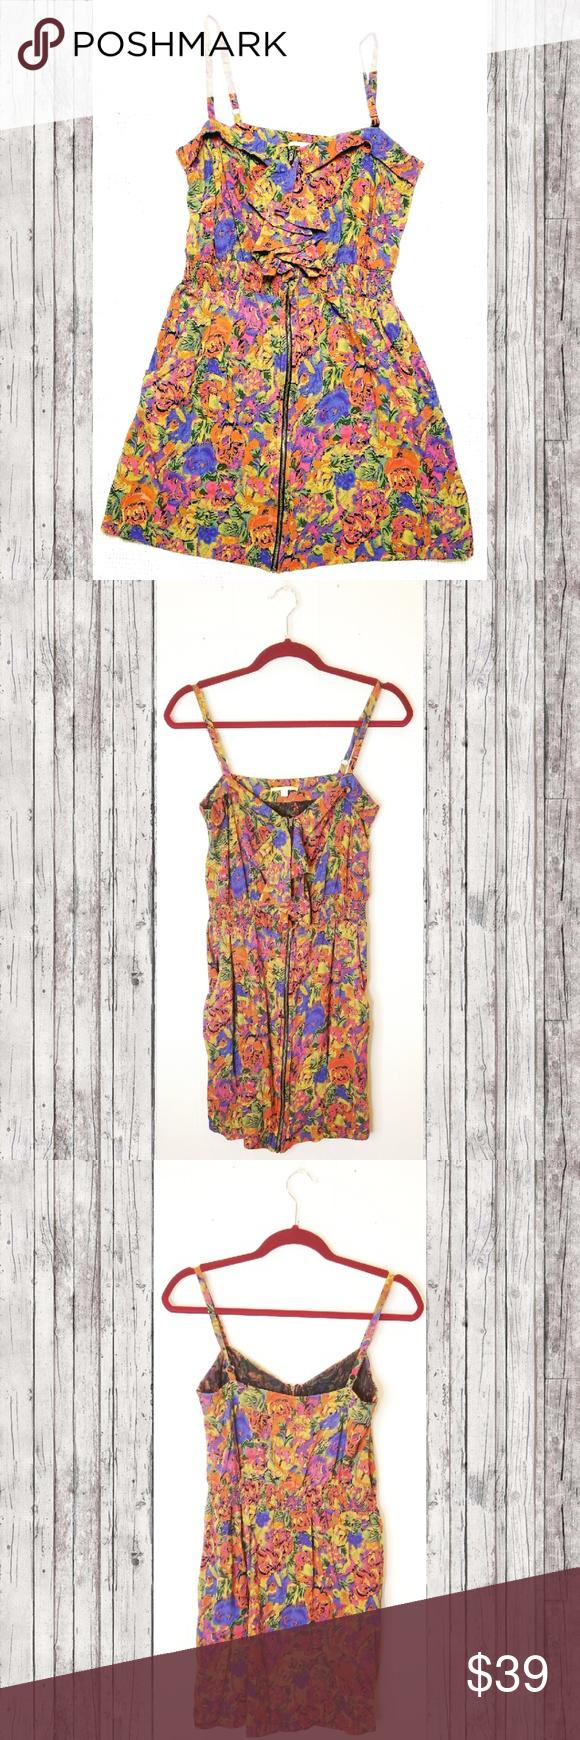 Gianni bini abstract rose zipper dress in my posh picks